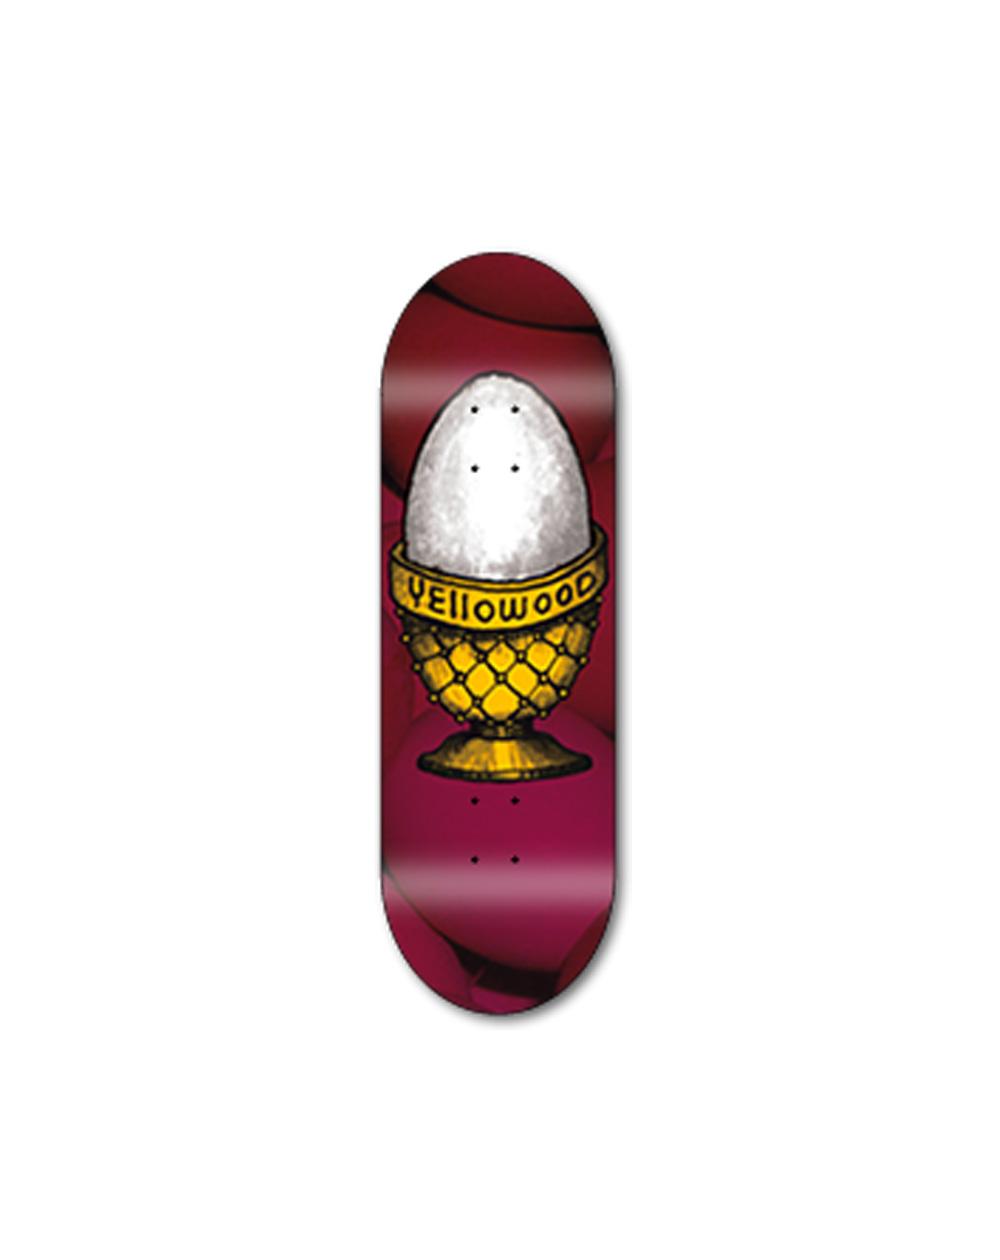 Yellowood Egg Z3 Fingerboard Deck